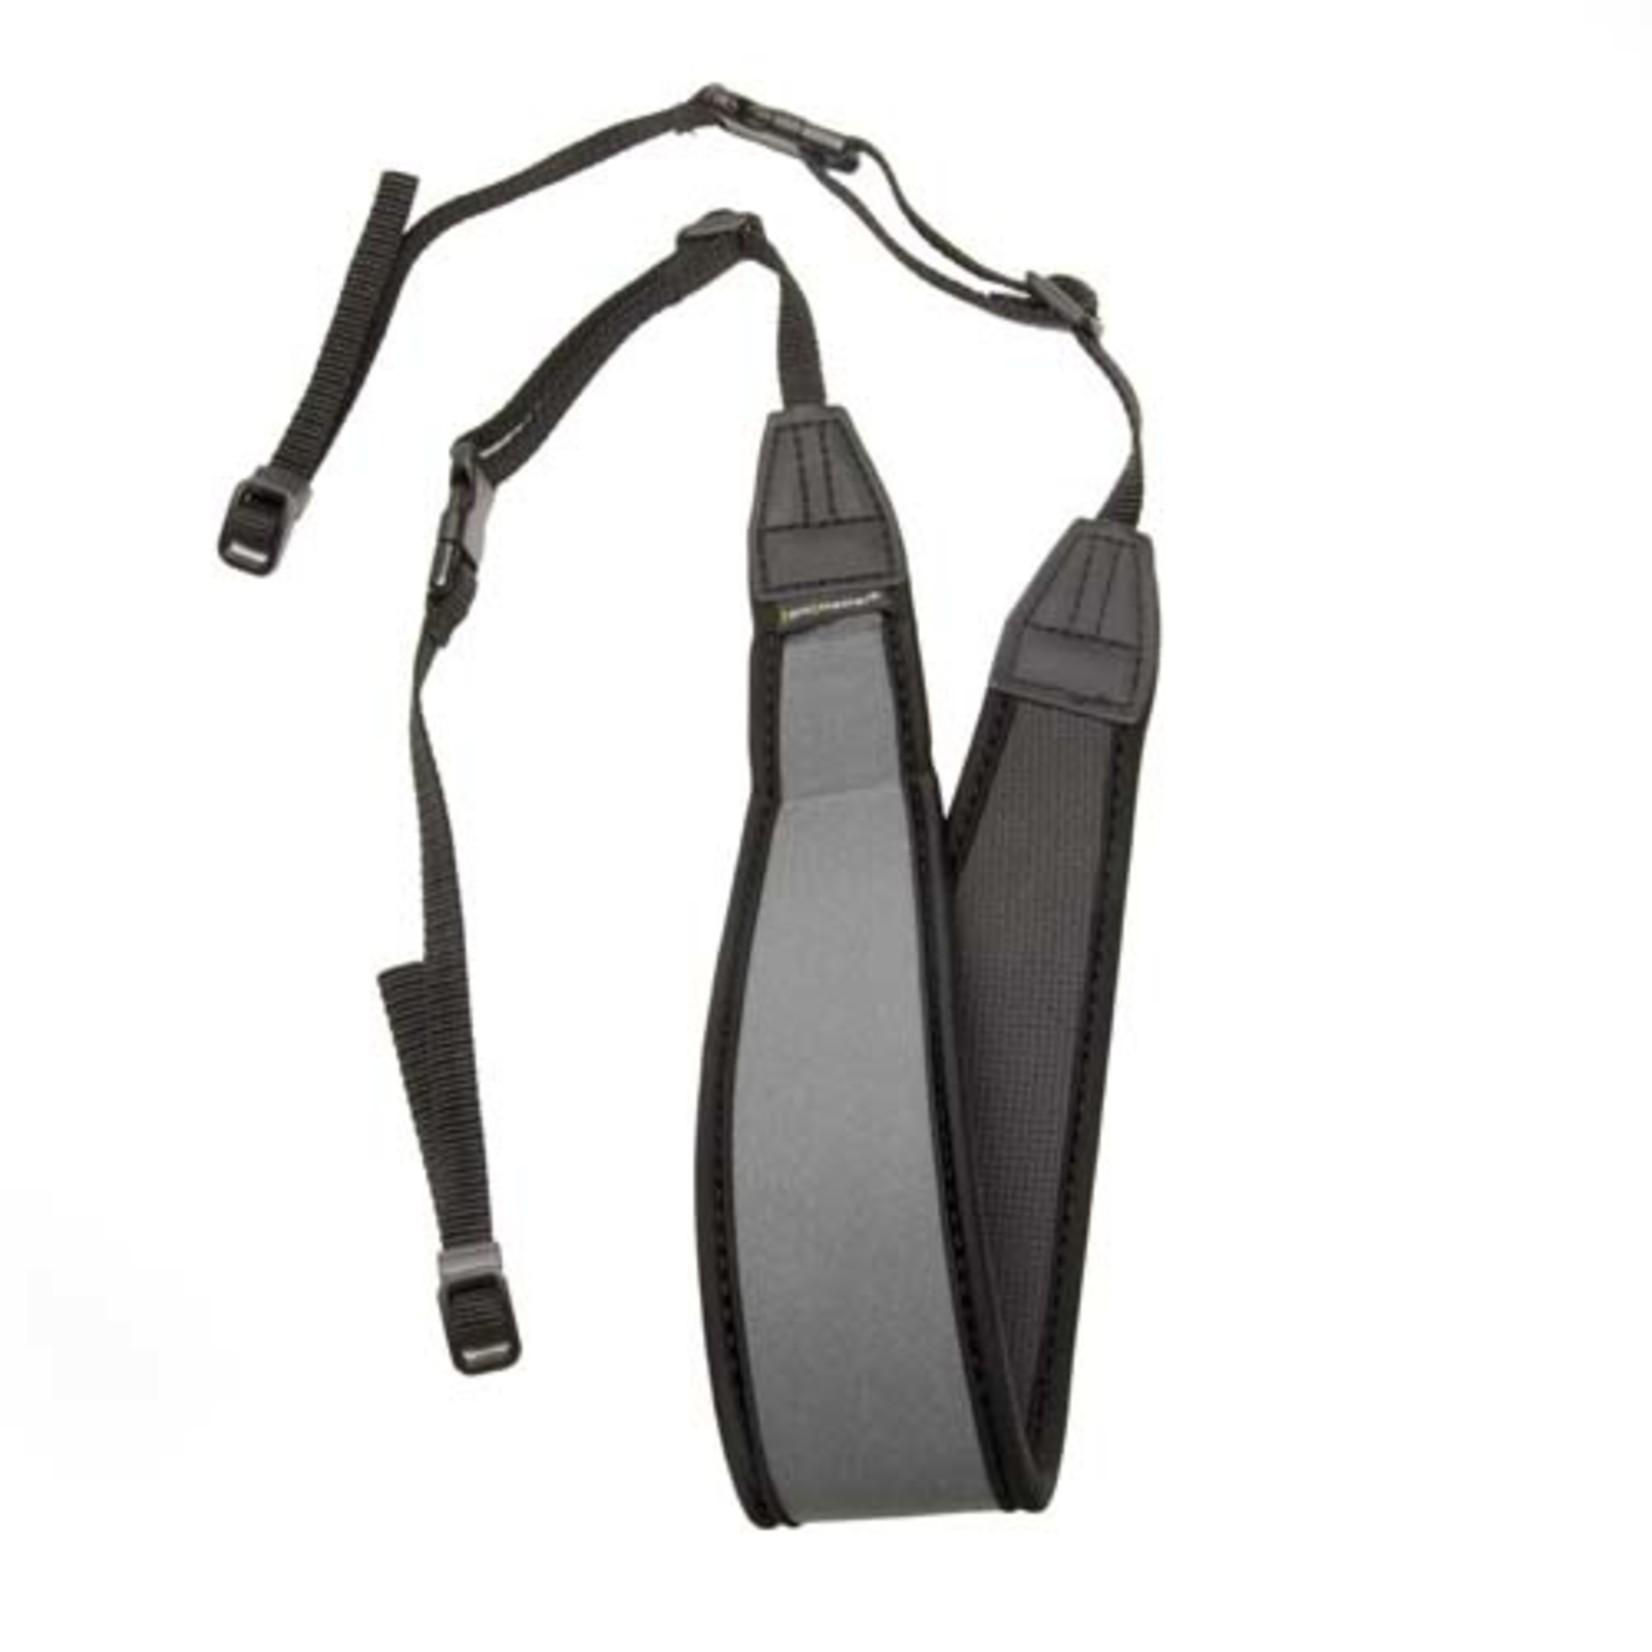 ProMaster Contour Strap - Grey